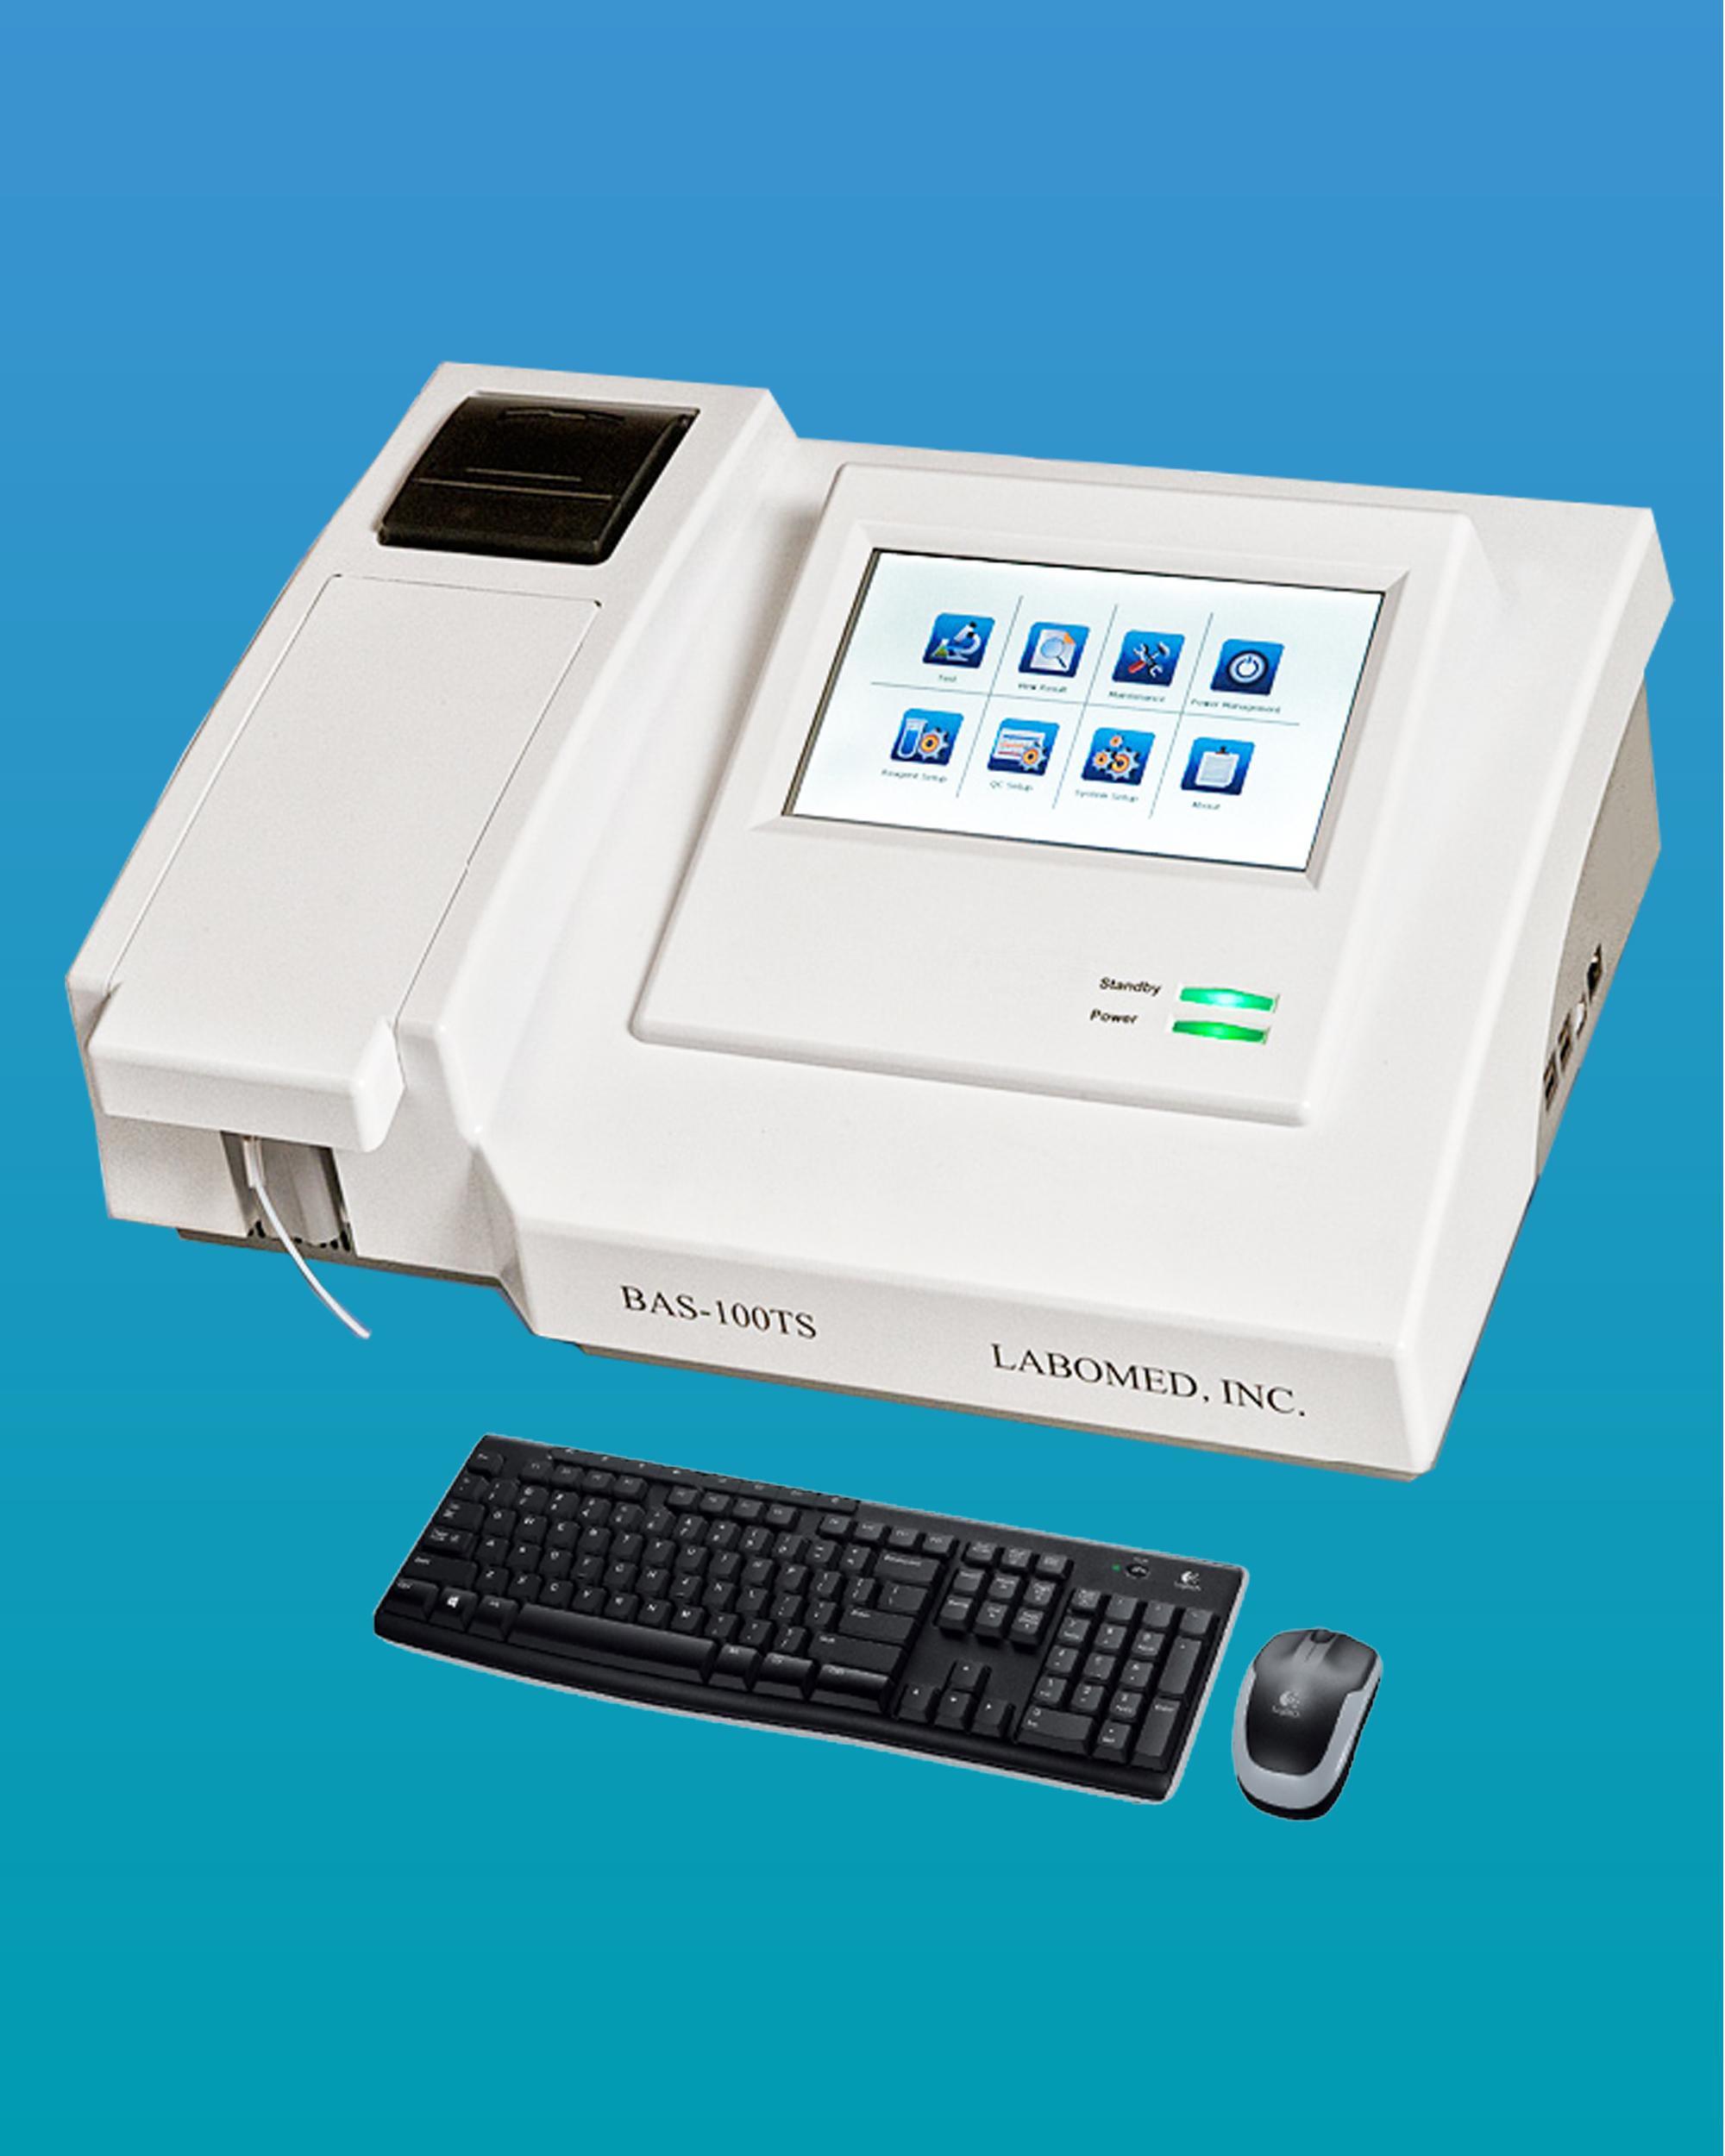 [BAS-100TS] Semi-Automatic Clinical Chemistry Analyzer